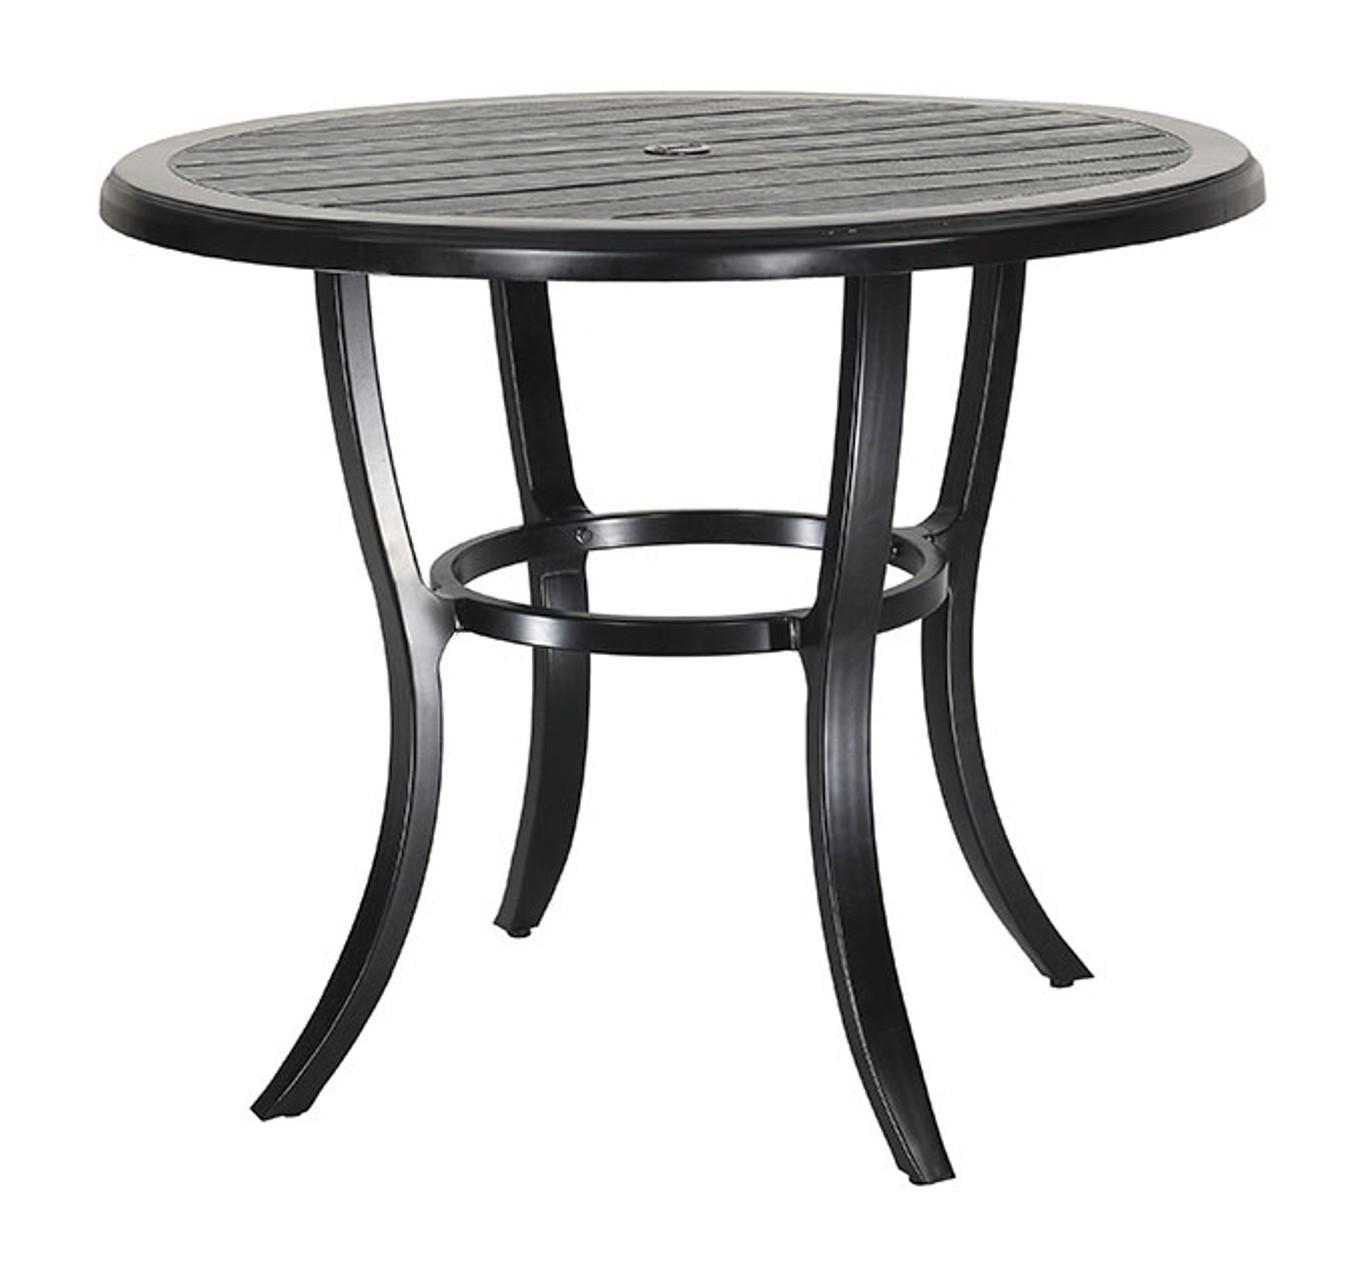 Gensun Lattice Outdoor Round Balcony Table - Round lattice coffee table